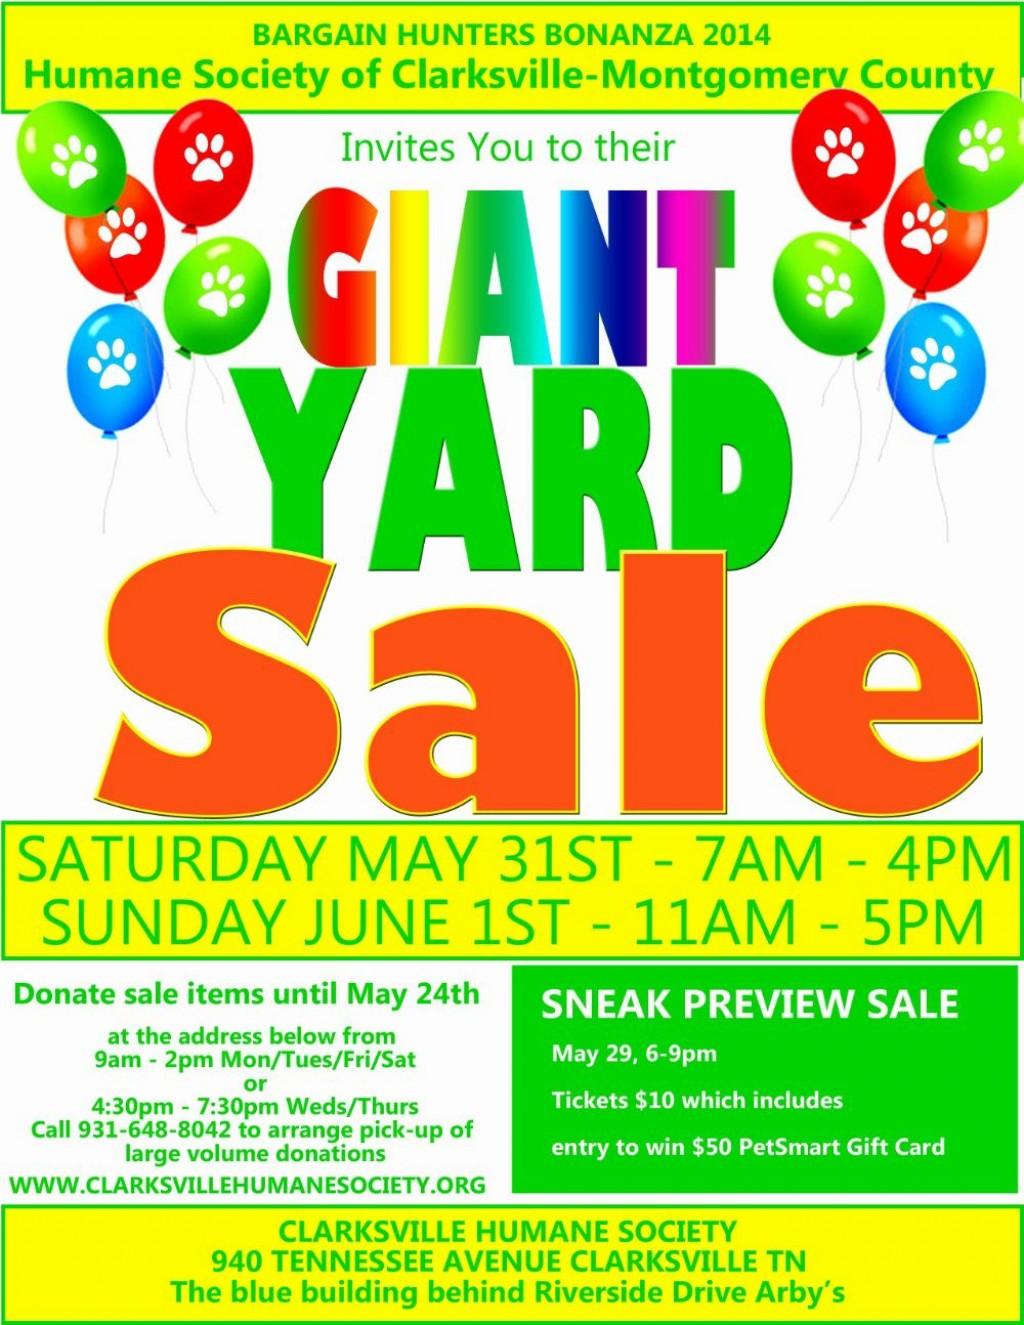 007 Outstanding Garage Sale Flyer Template Free Sample  Community Neighborhood YardLarge